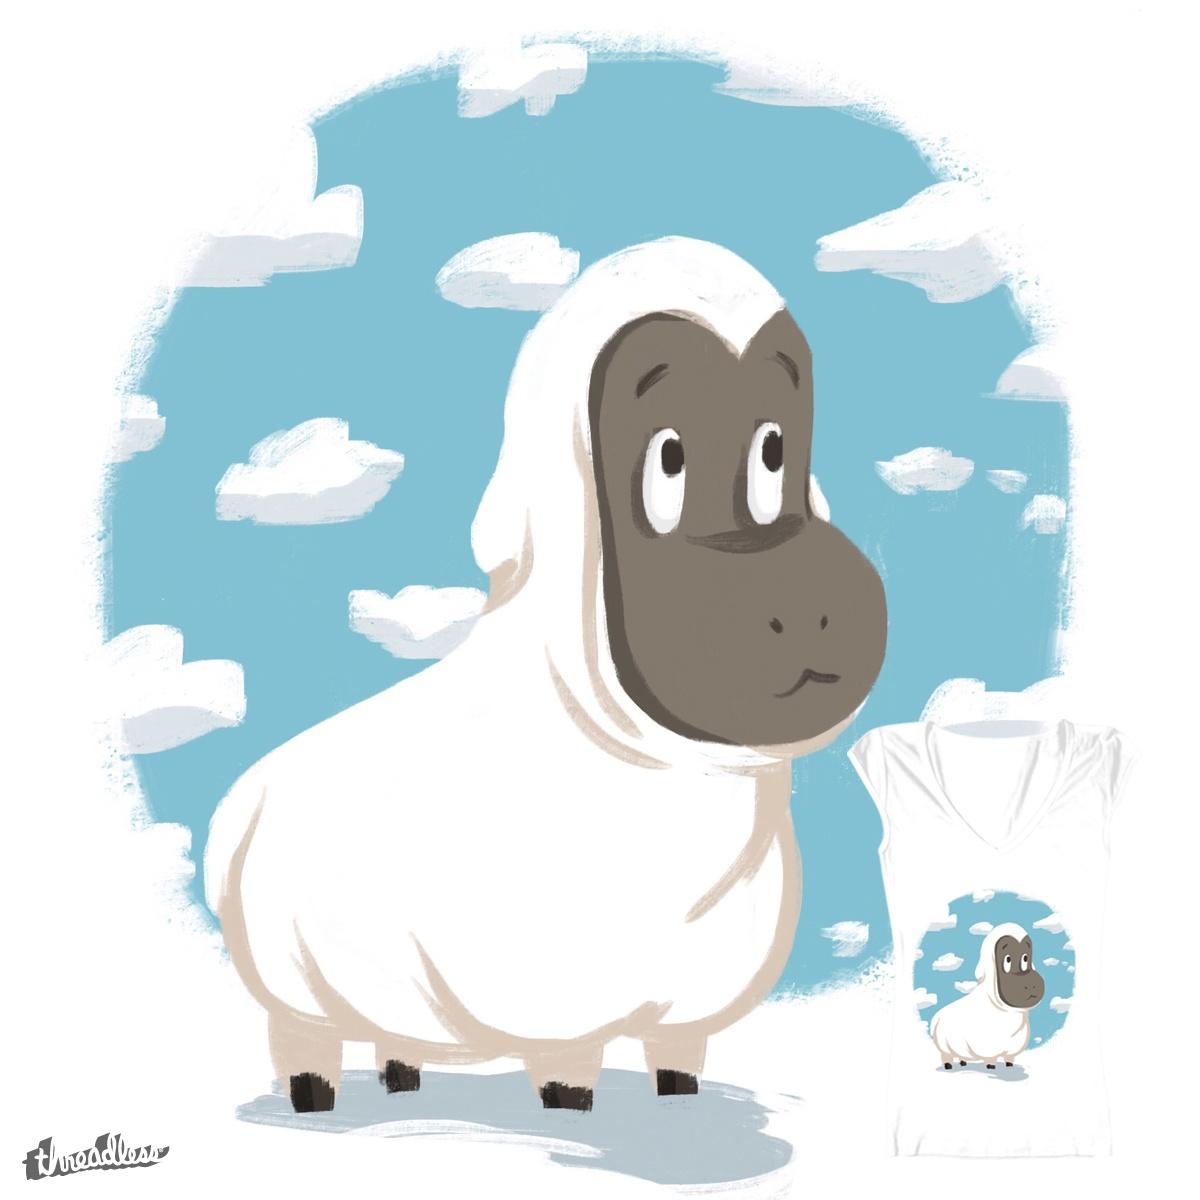 Dreaming sheep by Roman_OrLove on Threadless